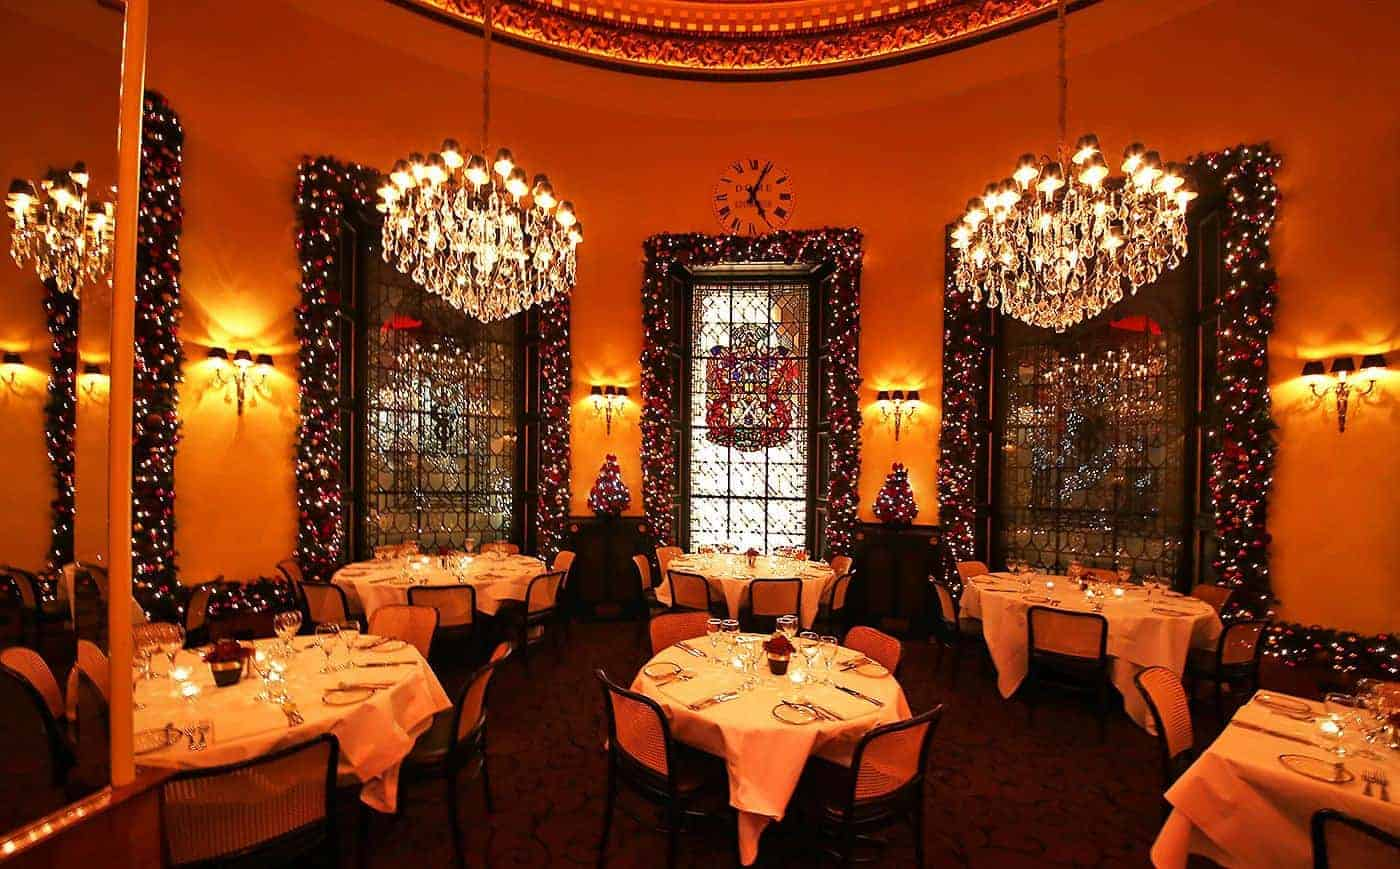 Birchall Tea's Christmas Dinner Venues